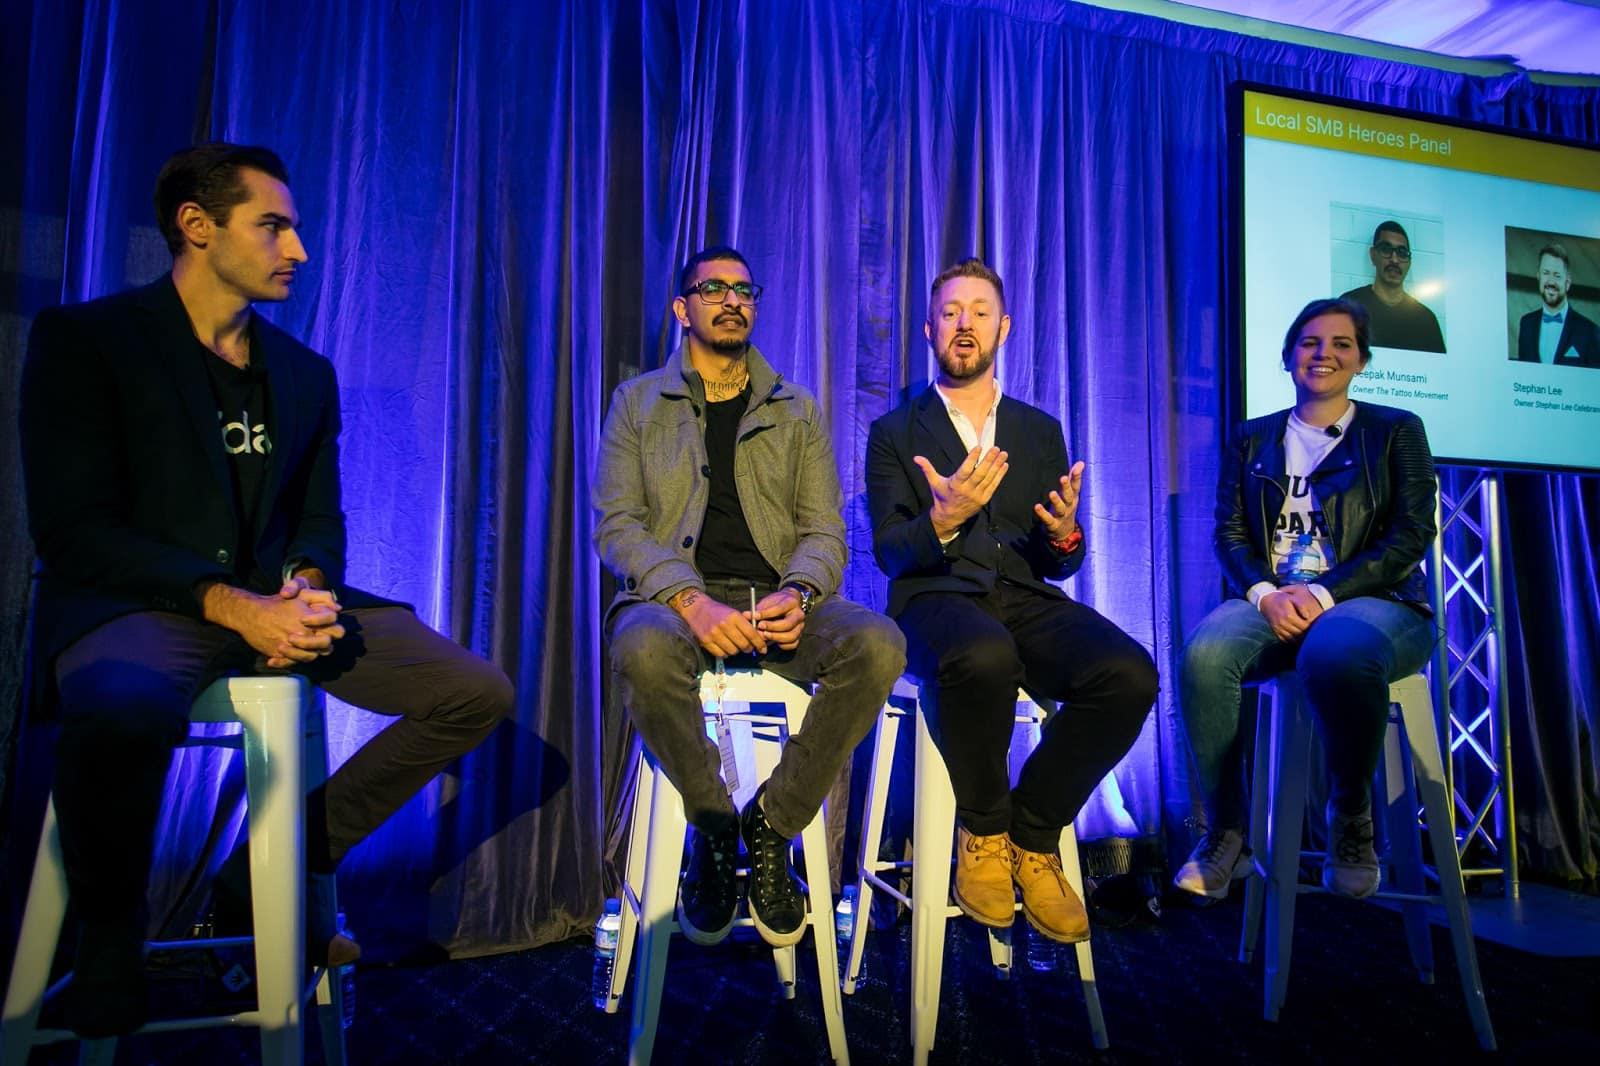 Sydney Marriage Celebrant Stephen Lee speaks at the Google Australia Digital Garage event